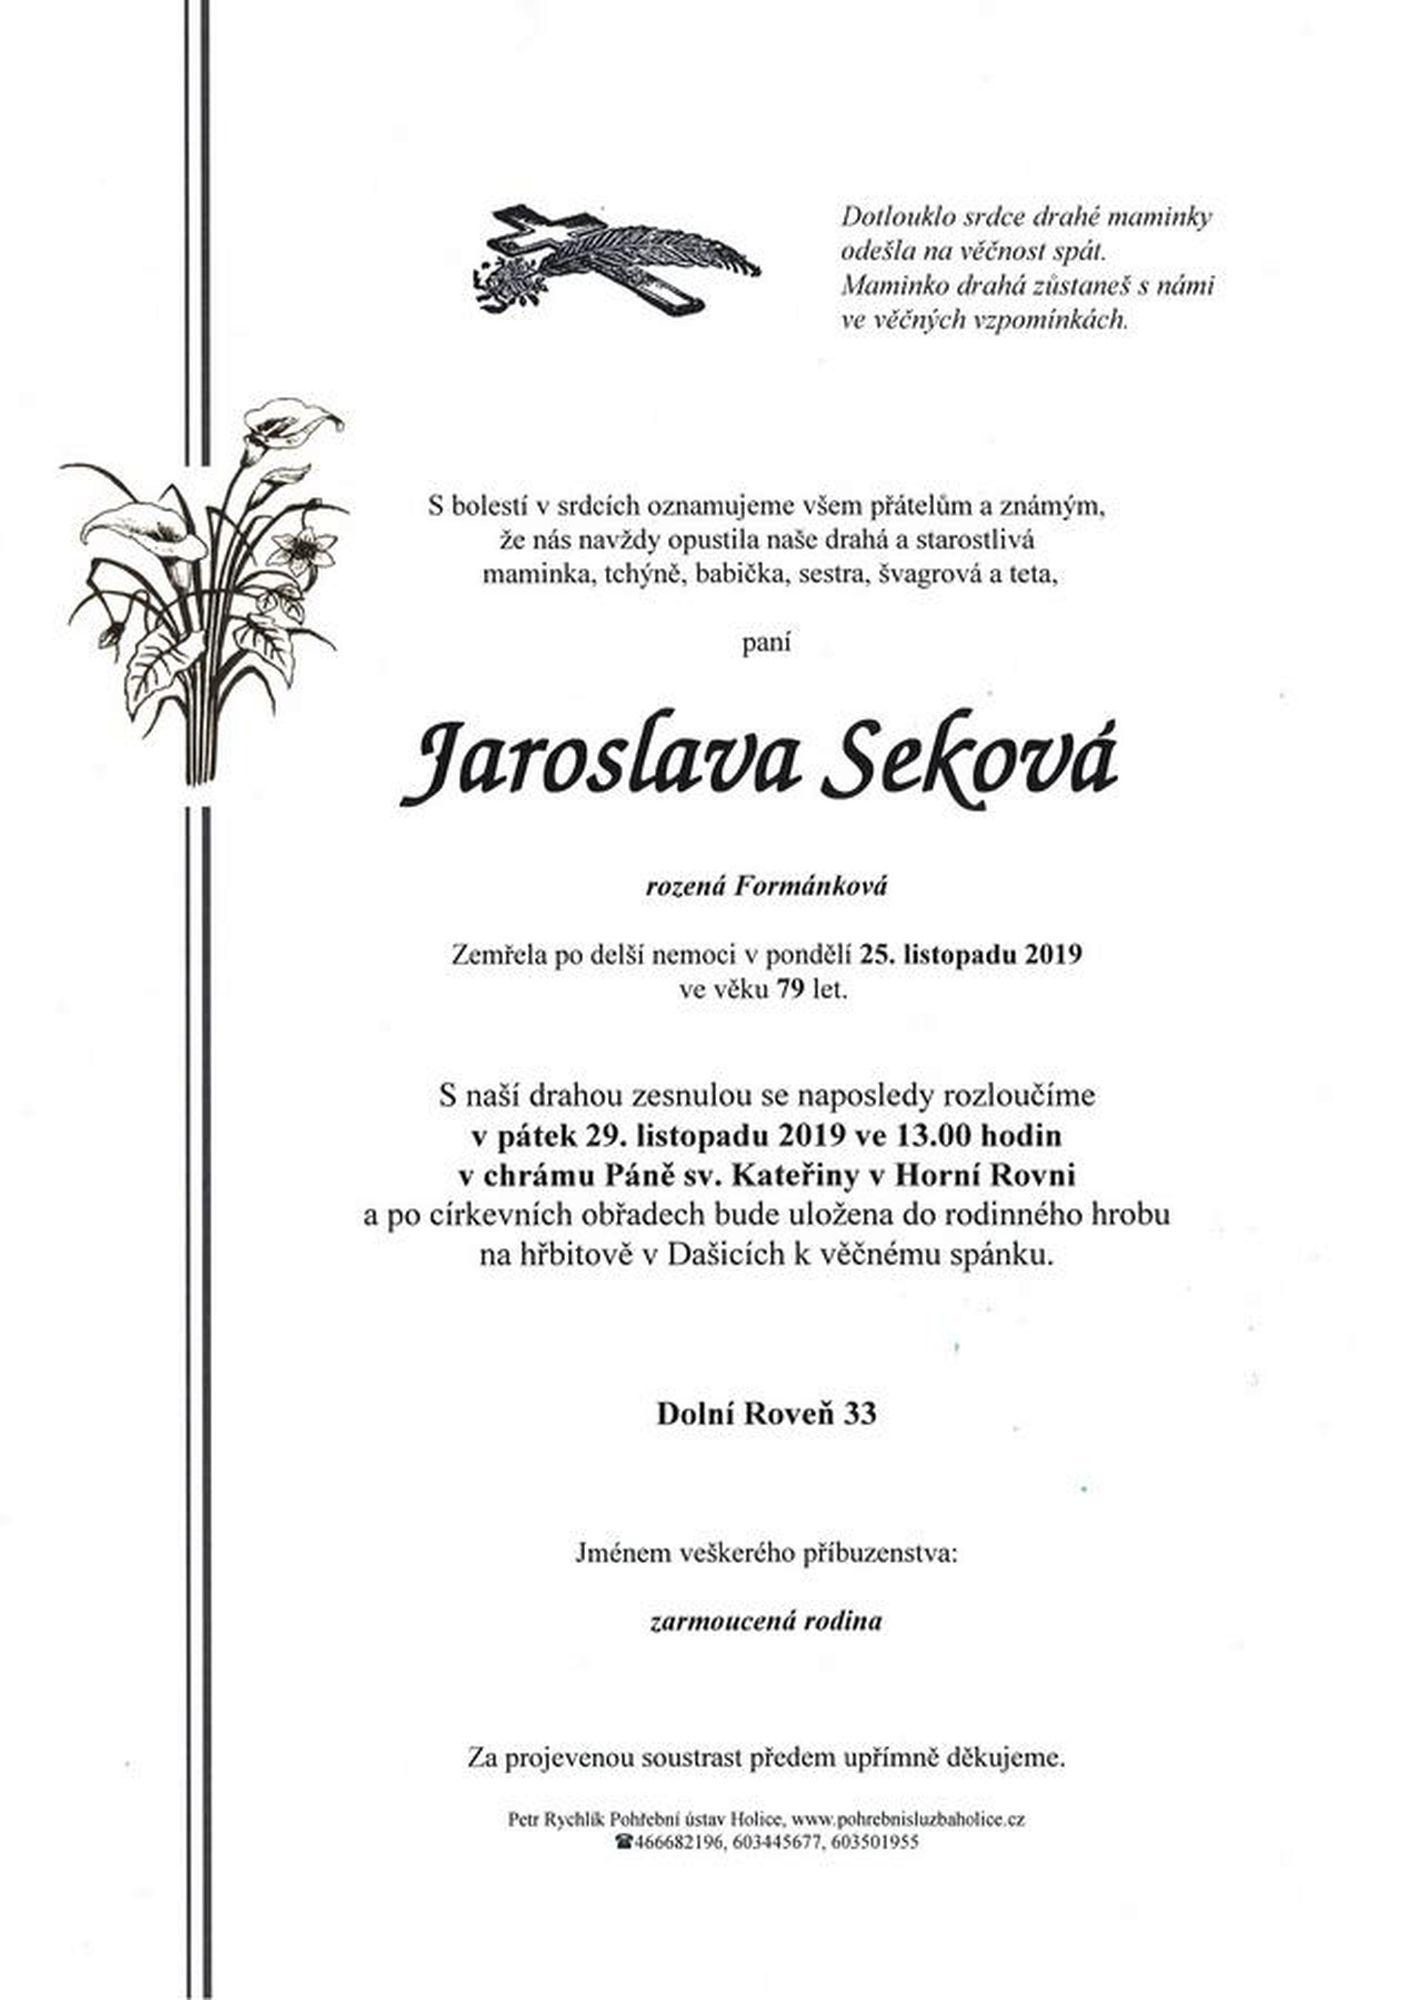 Jaroslava Seková